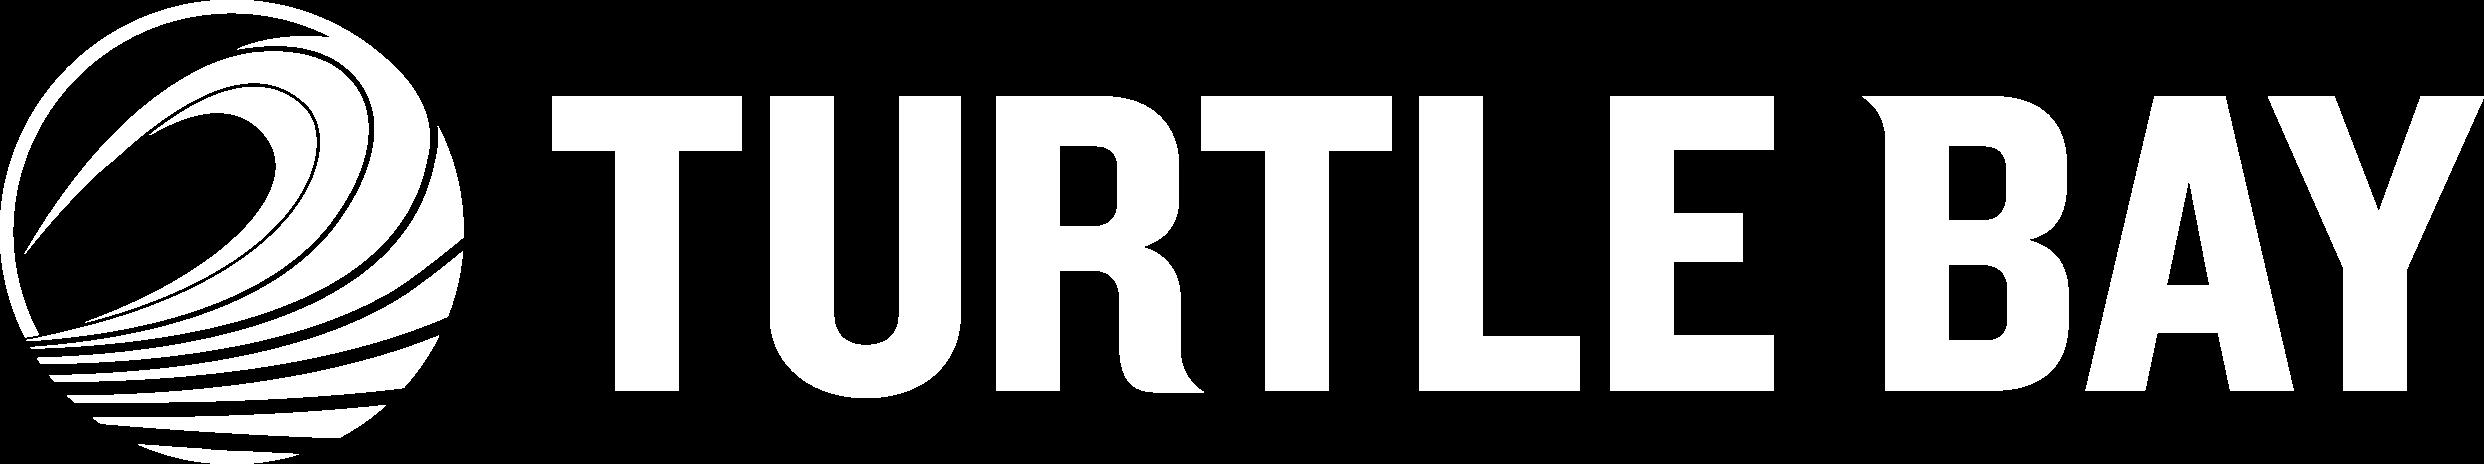 Logo for Turtle Bay Resort